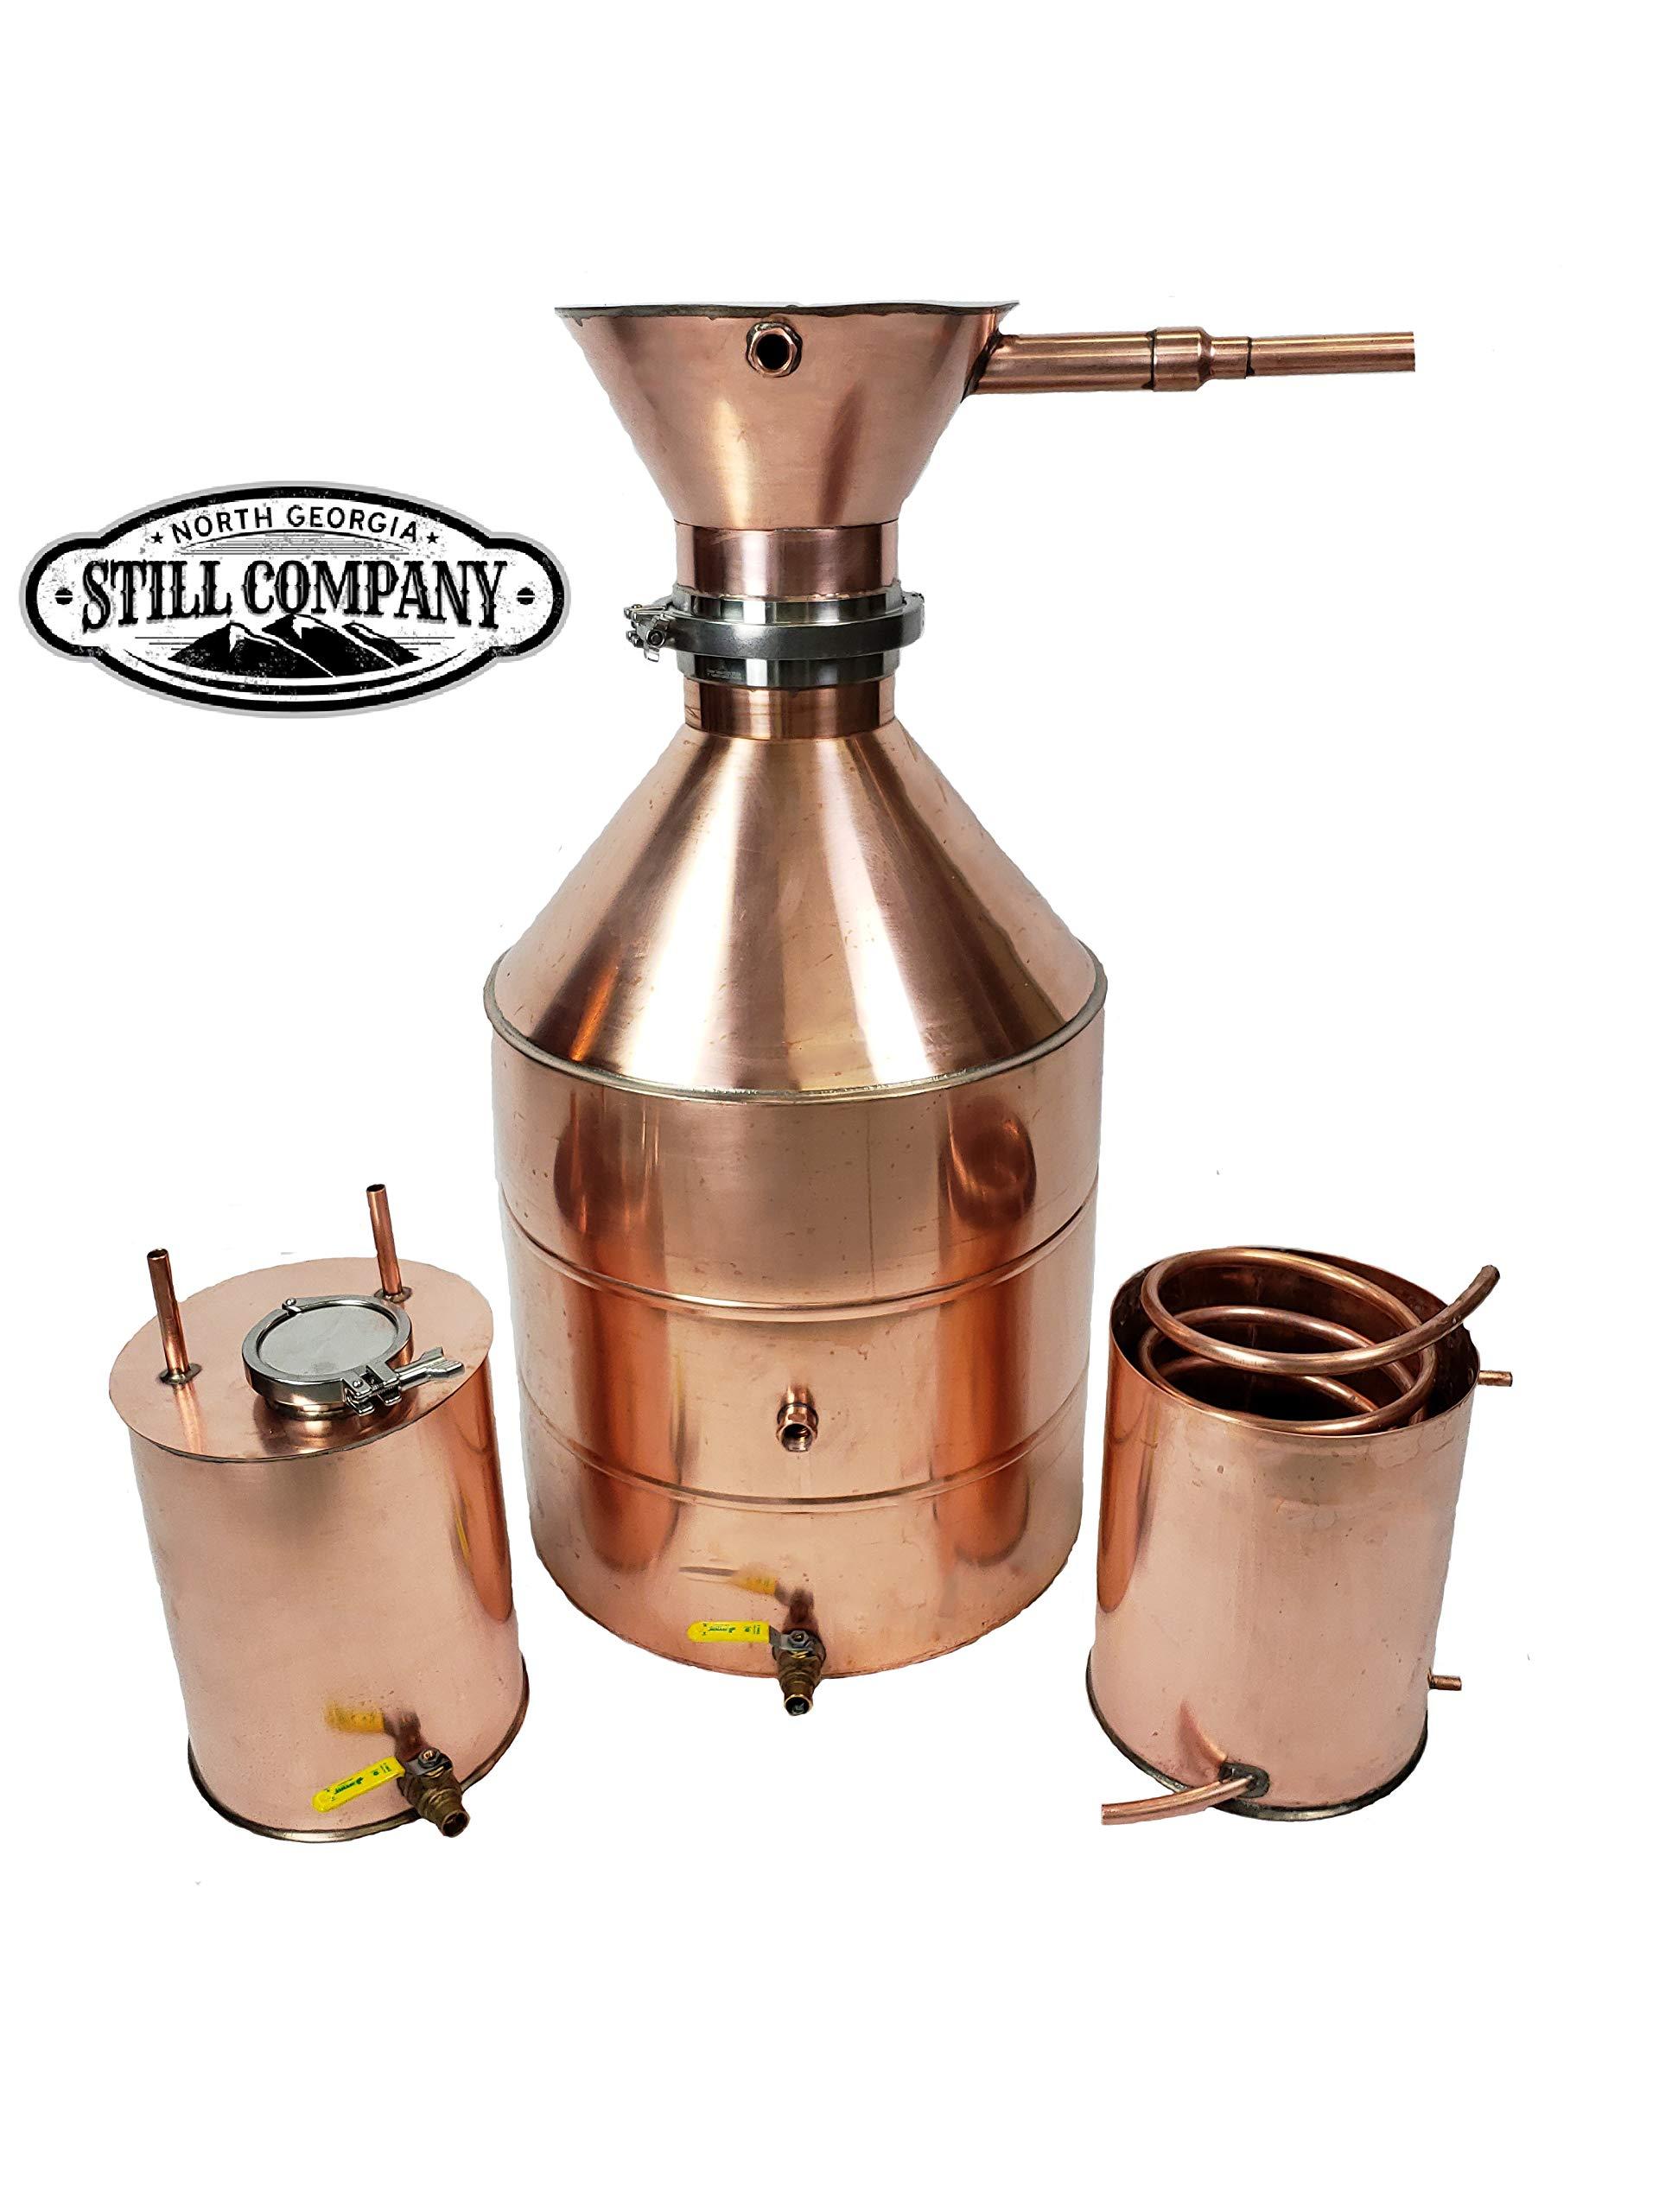 20 Gallon Copper Moonshine Whiskey Still with Large Tri Clamp Cap & Ball Valve Drain, 3 Gallon Worm, 3 Gallon Thumper with 3 Inch Fruit Port, 1/2 OD Copper Tubing by North Georgia Still Company